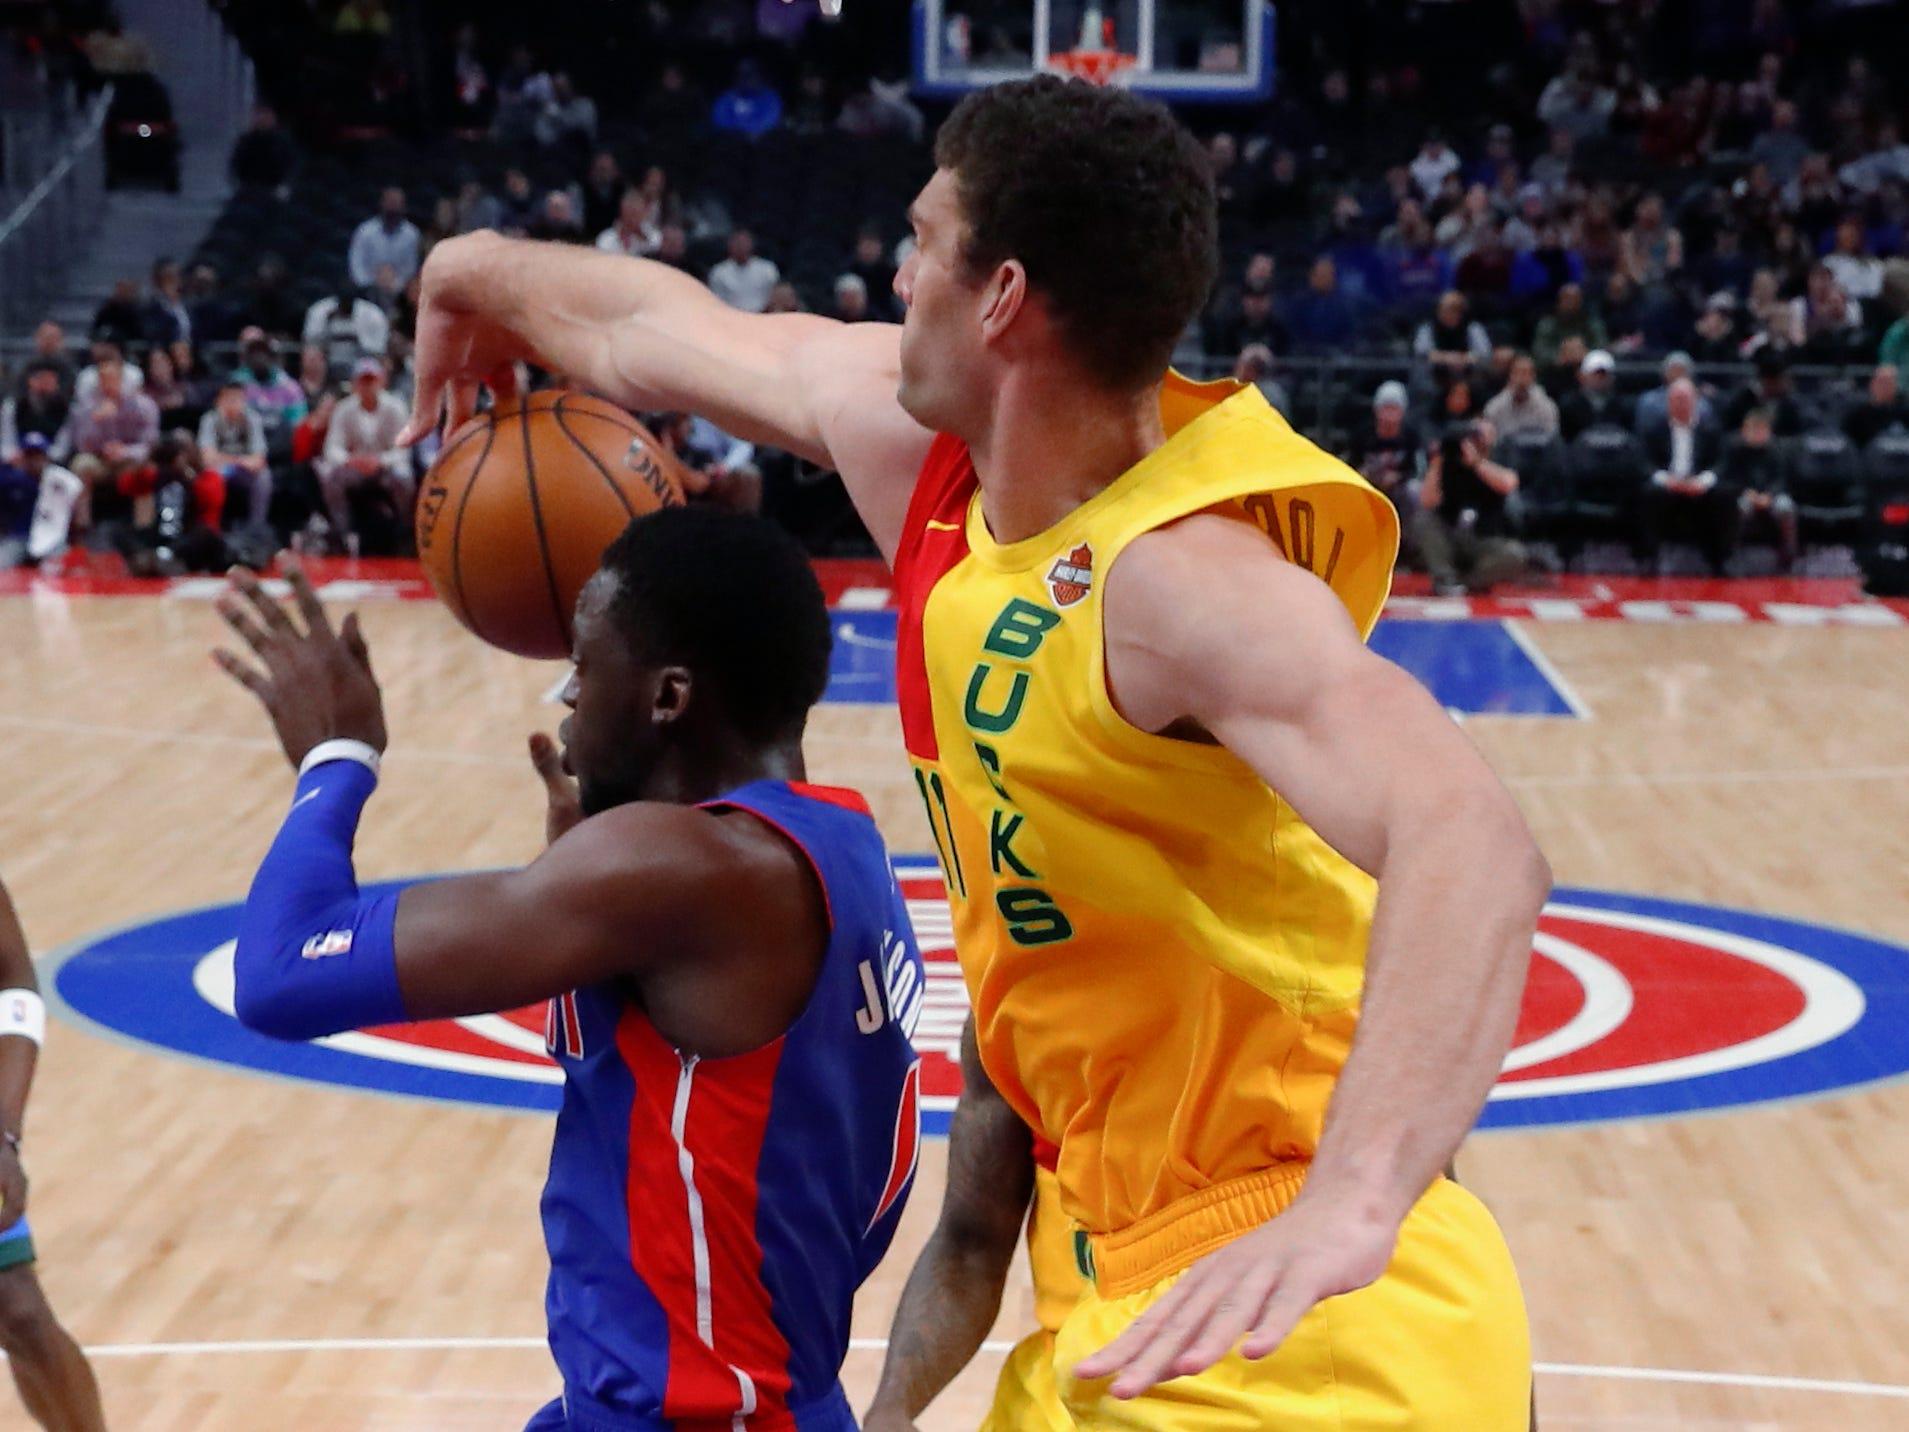 Bucks center Brook Lopez blocks a shot by Pistons guard Reggie Jackson on Tuesday night.